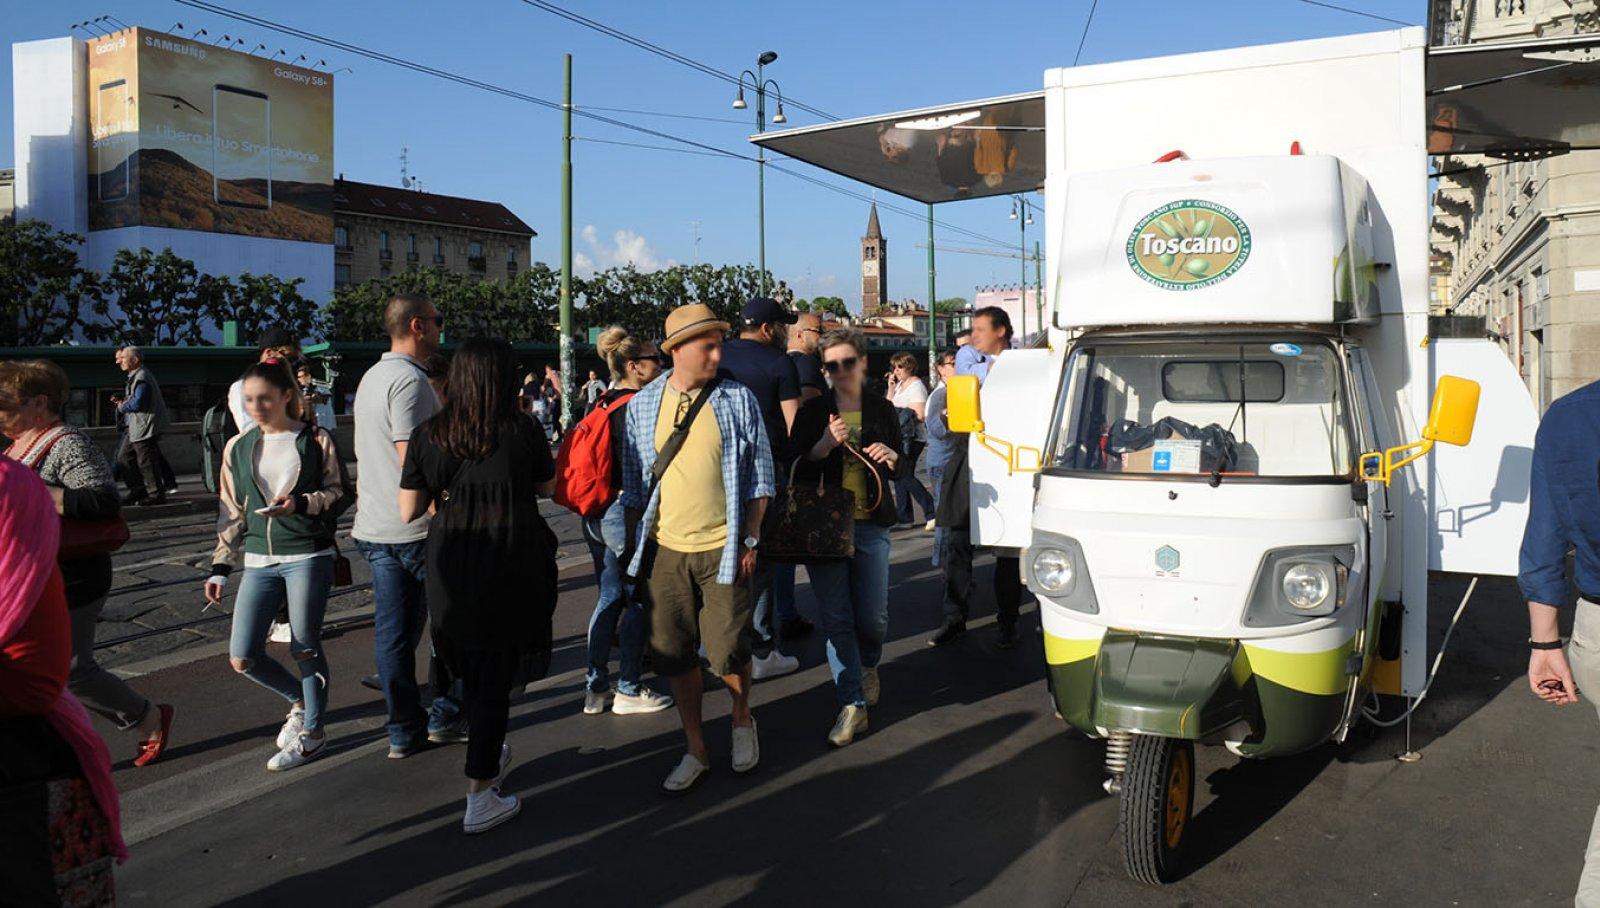 Milan Food Week -Tuscan Oil  IGPDecaux